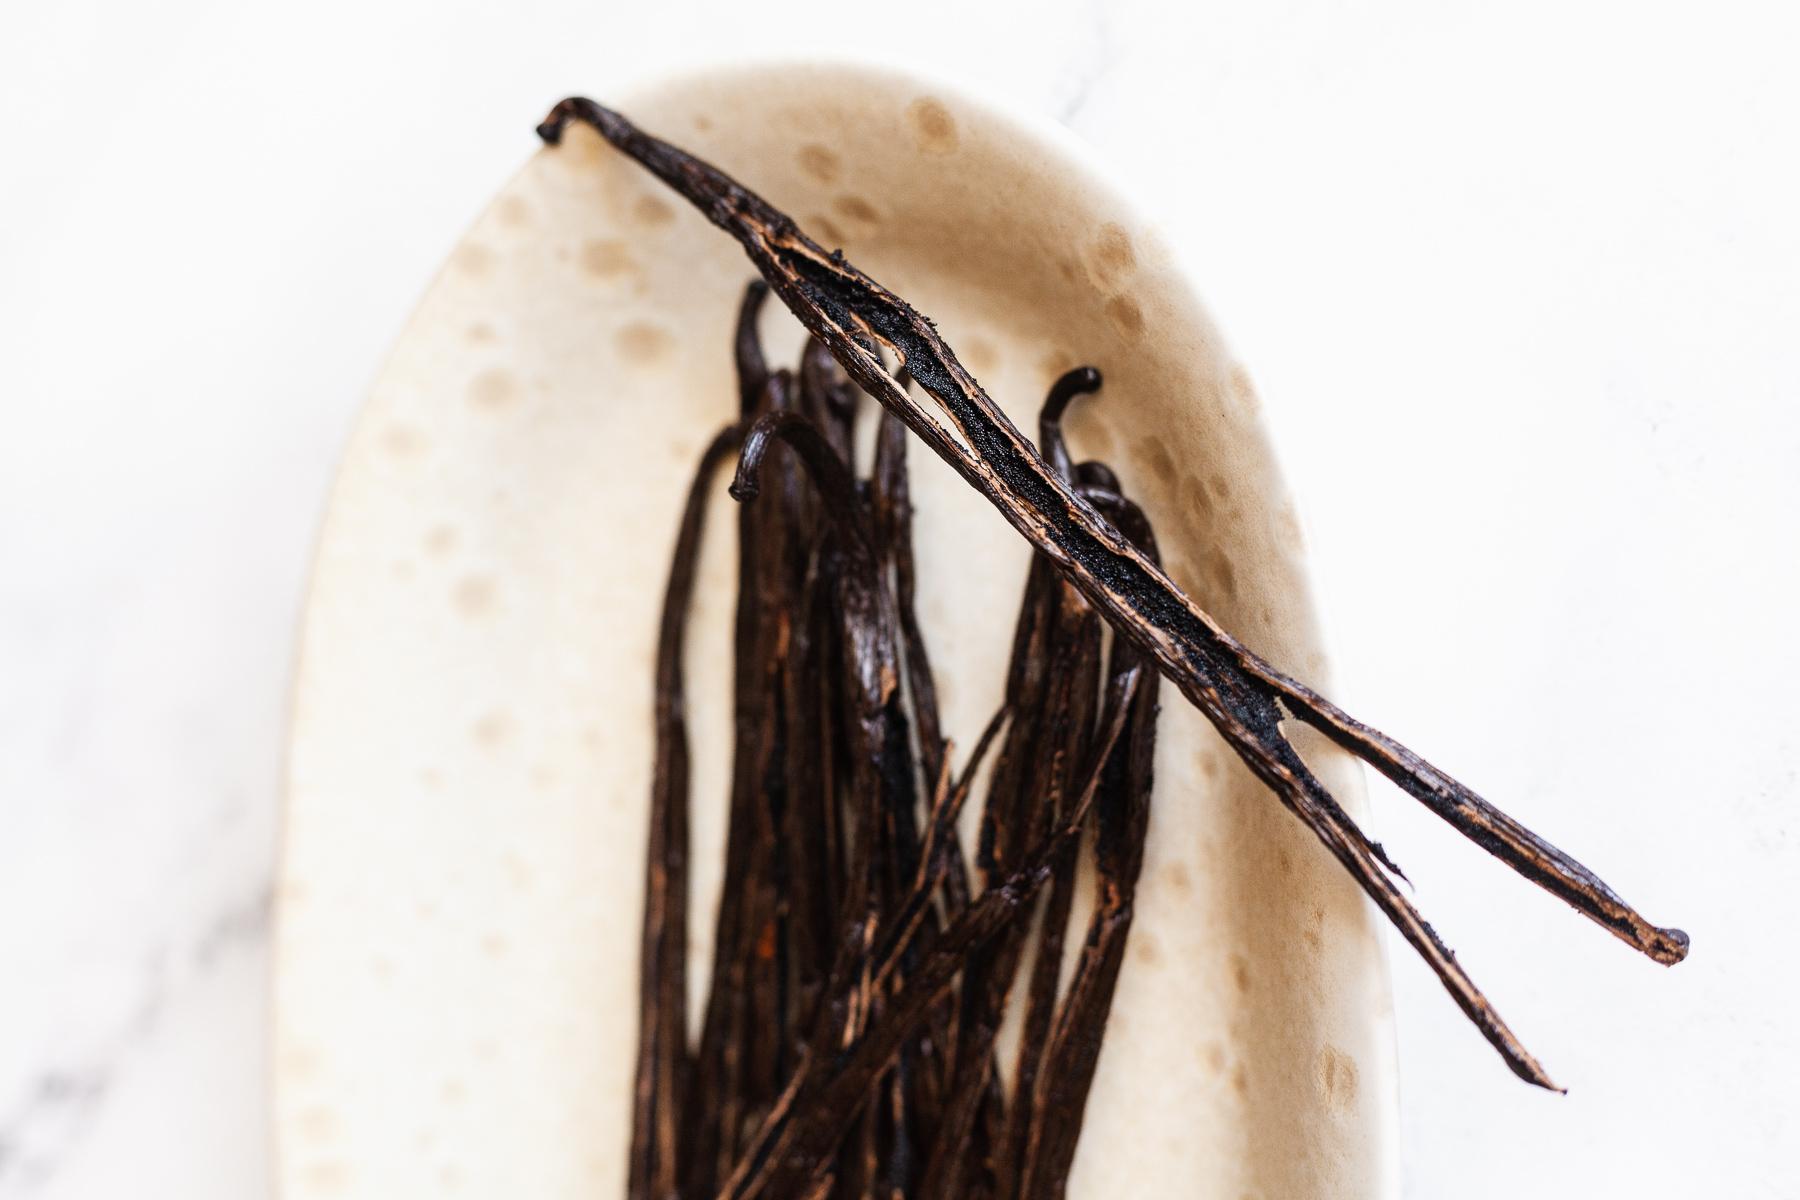 close up image of vanilla beans